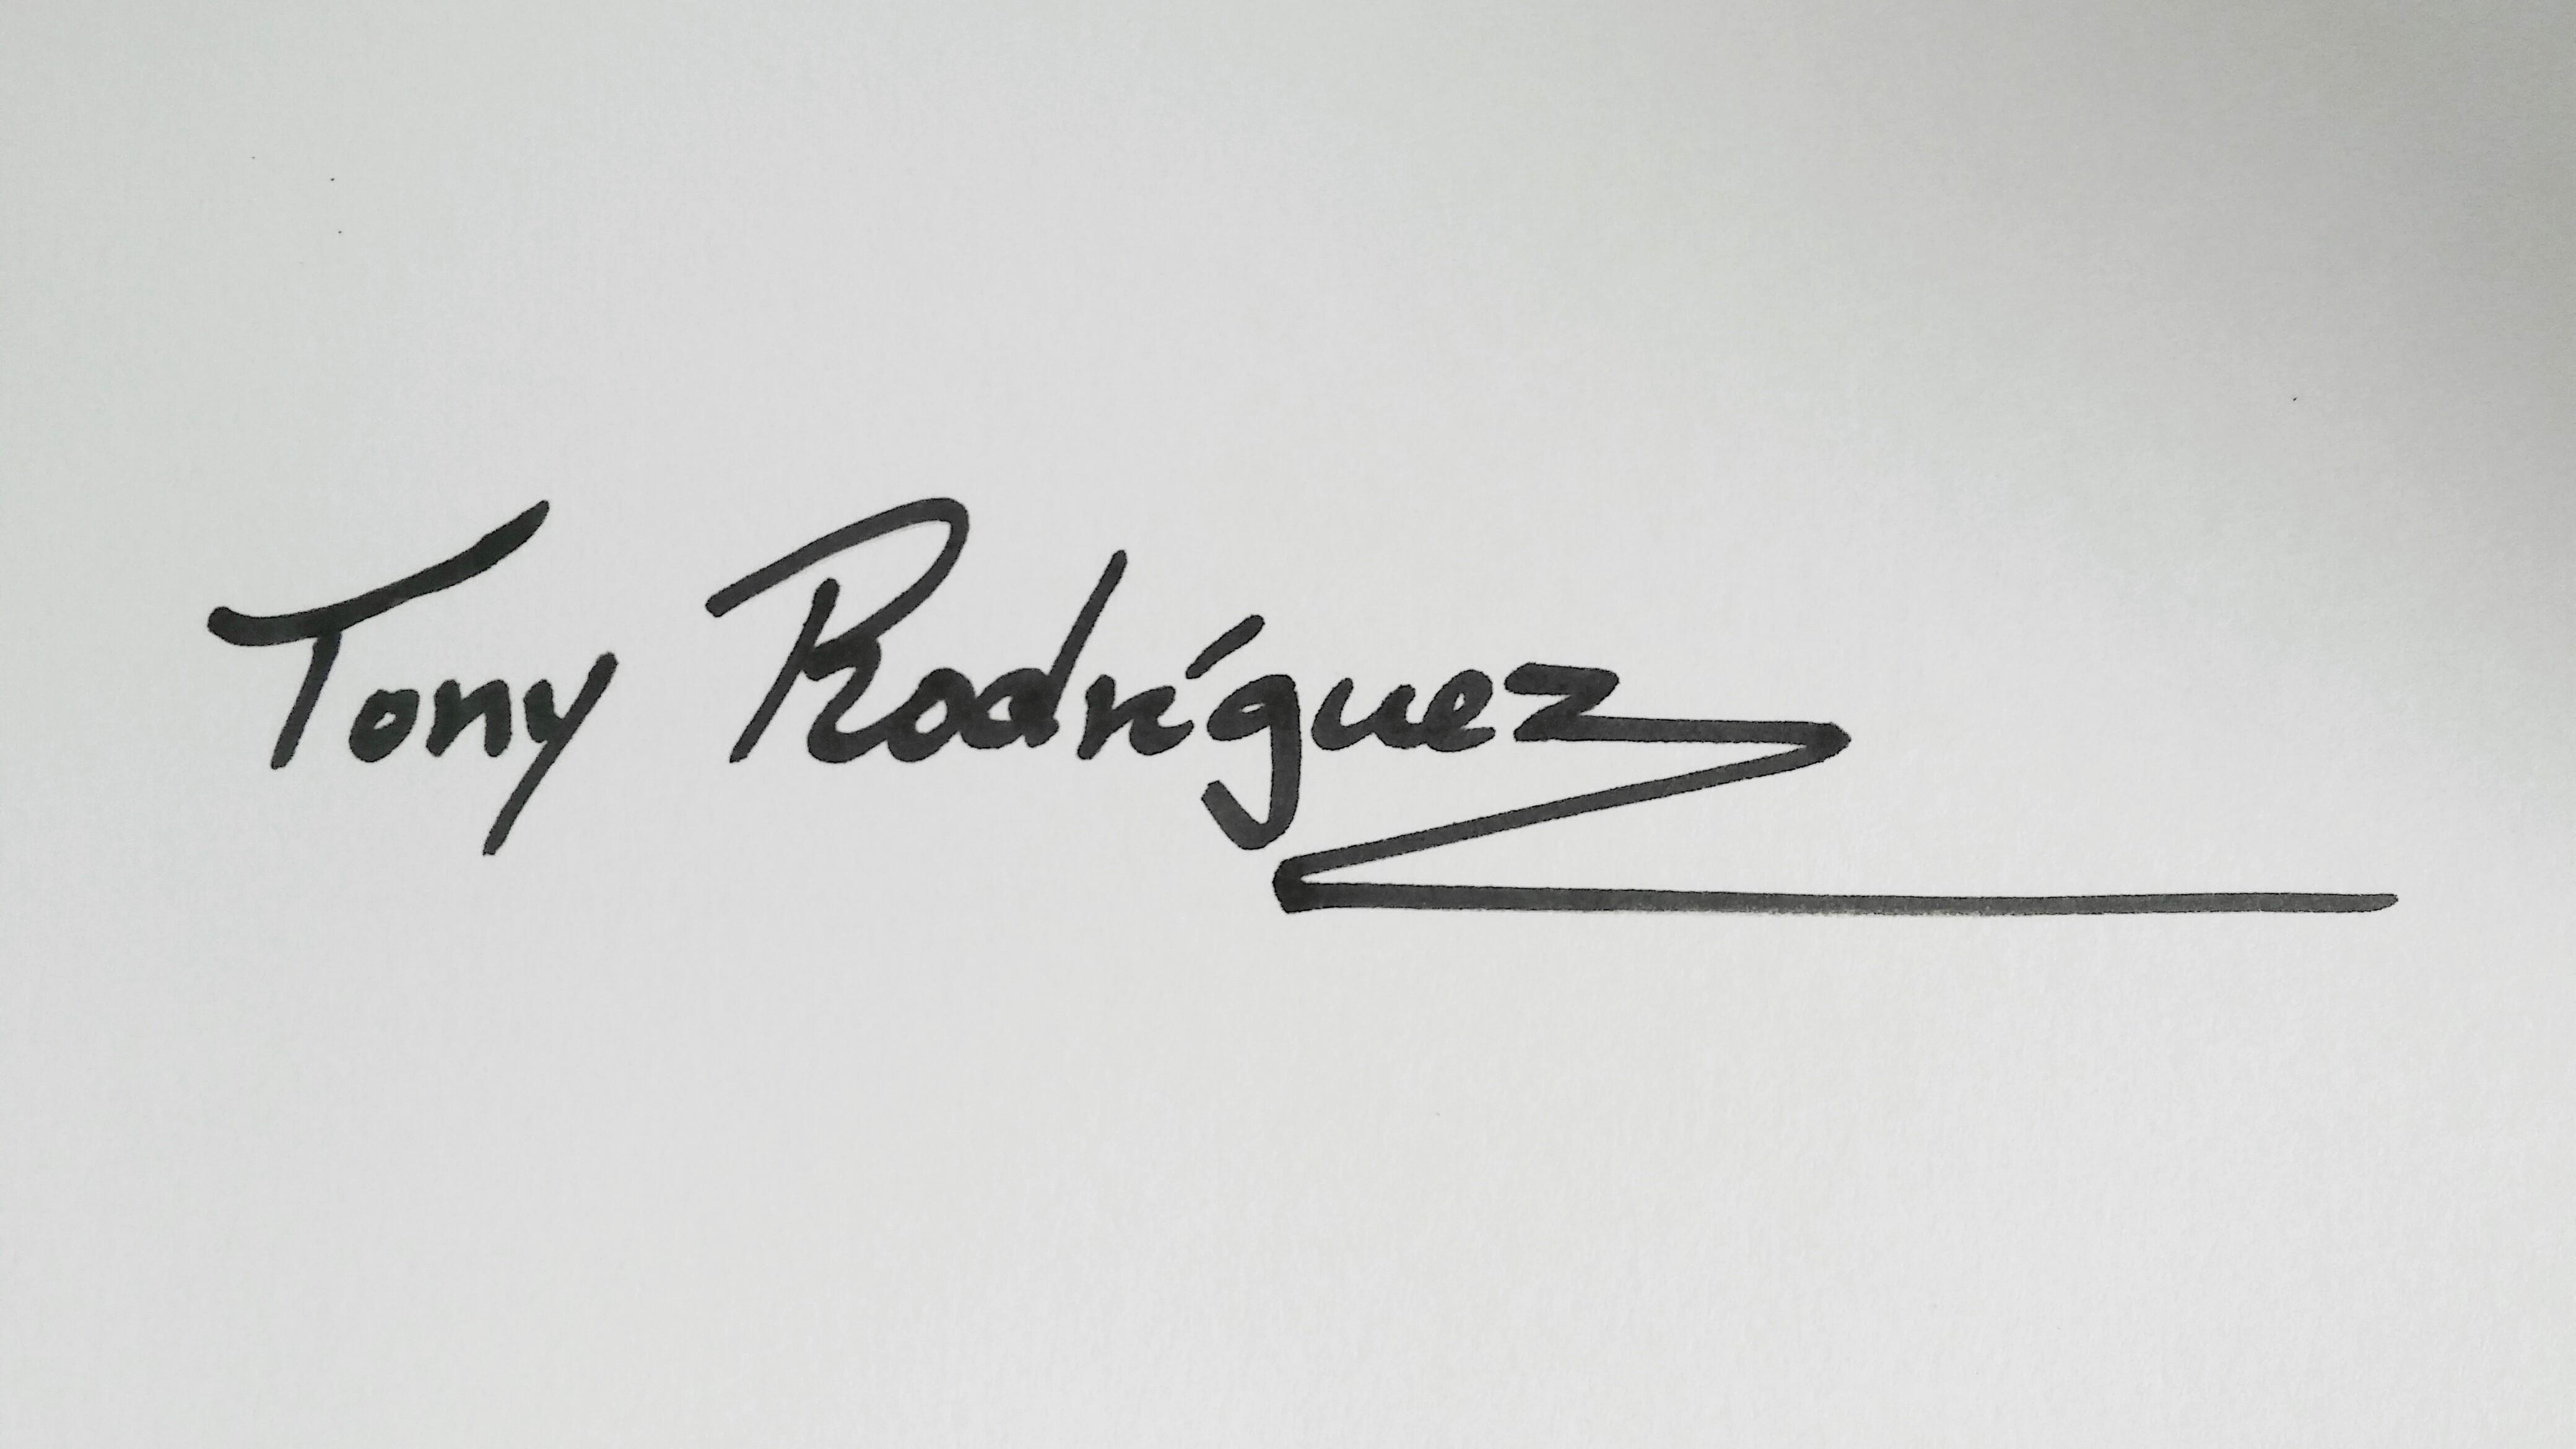 Tony Rodriguez's Signature